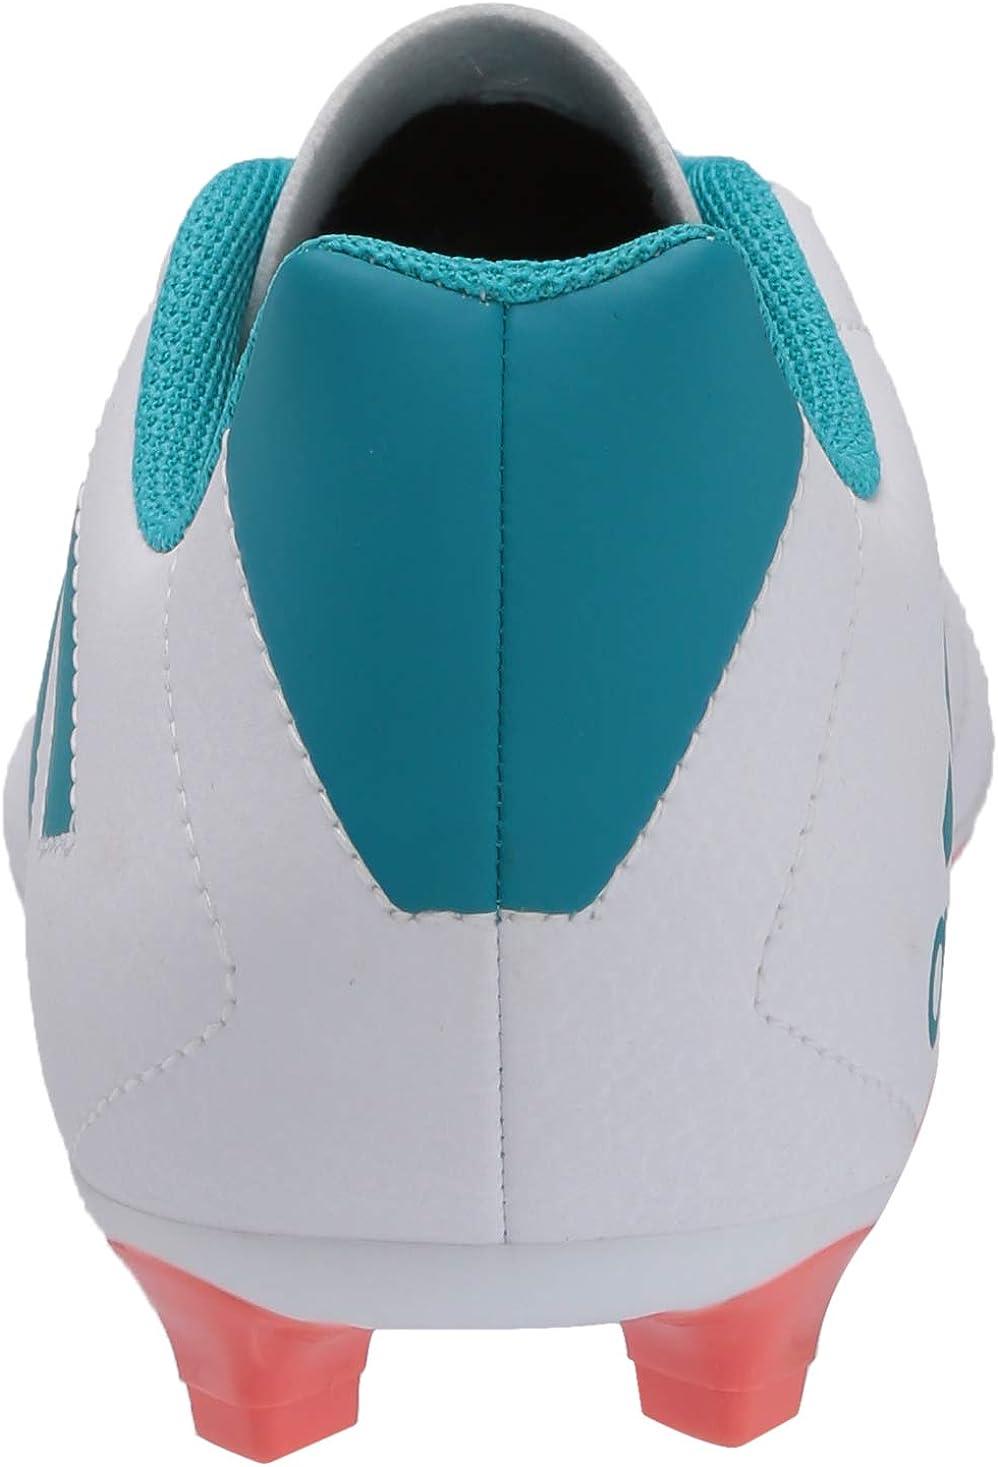 adidas Goletto VII FG W Tenis para Mujer Blanco Azul Energético Coral Fácil